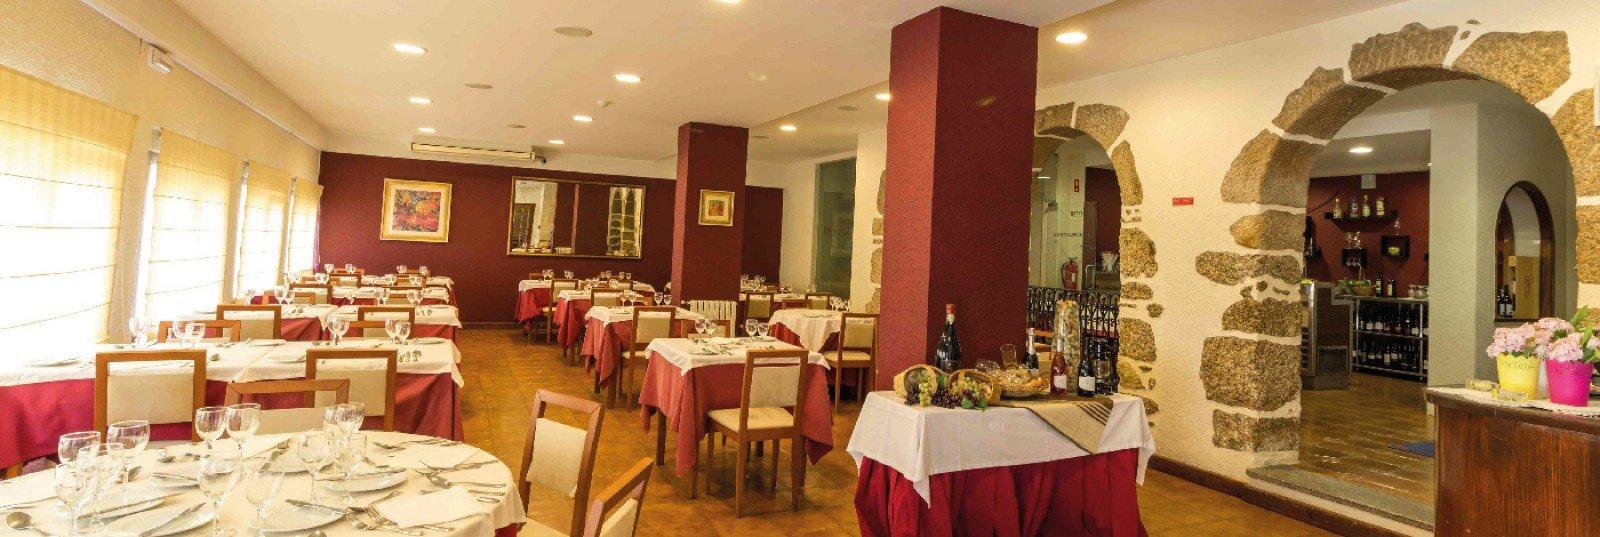 Hotel Eurosol Gouveia - restaurante